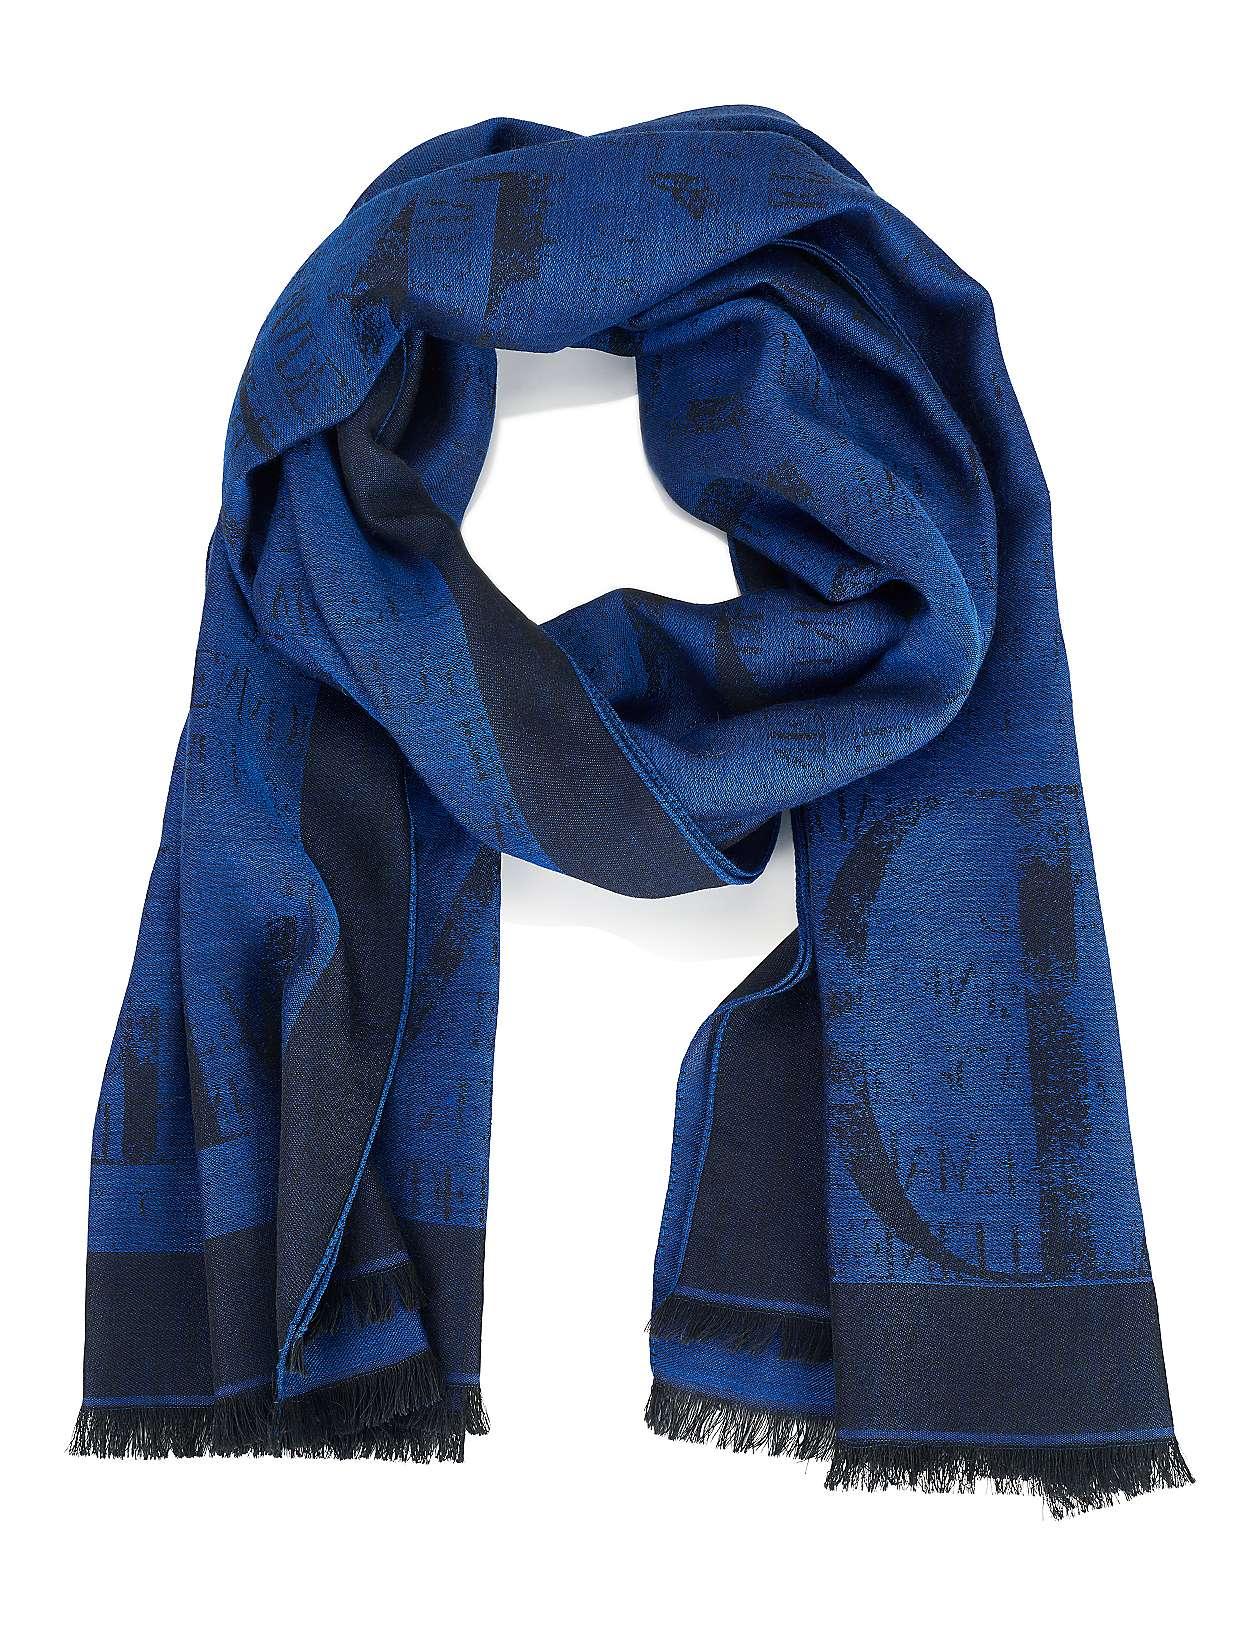 0ce6b242fe1fbd Tücher und Schals bequem online shoppen | MADELEINE Mode